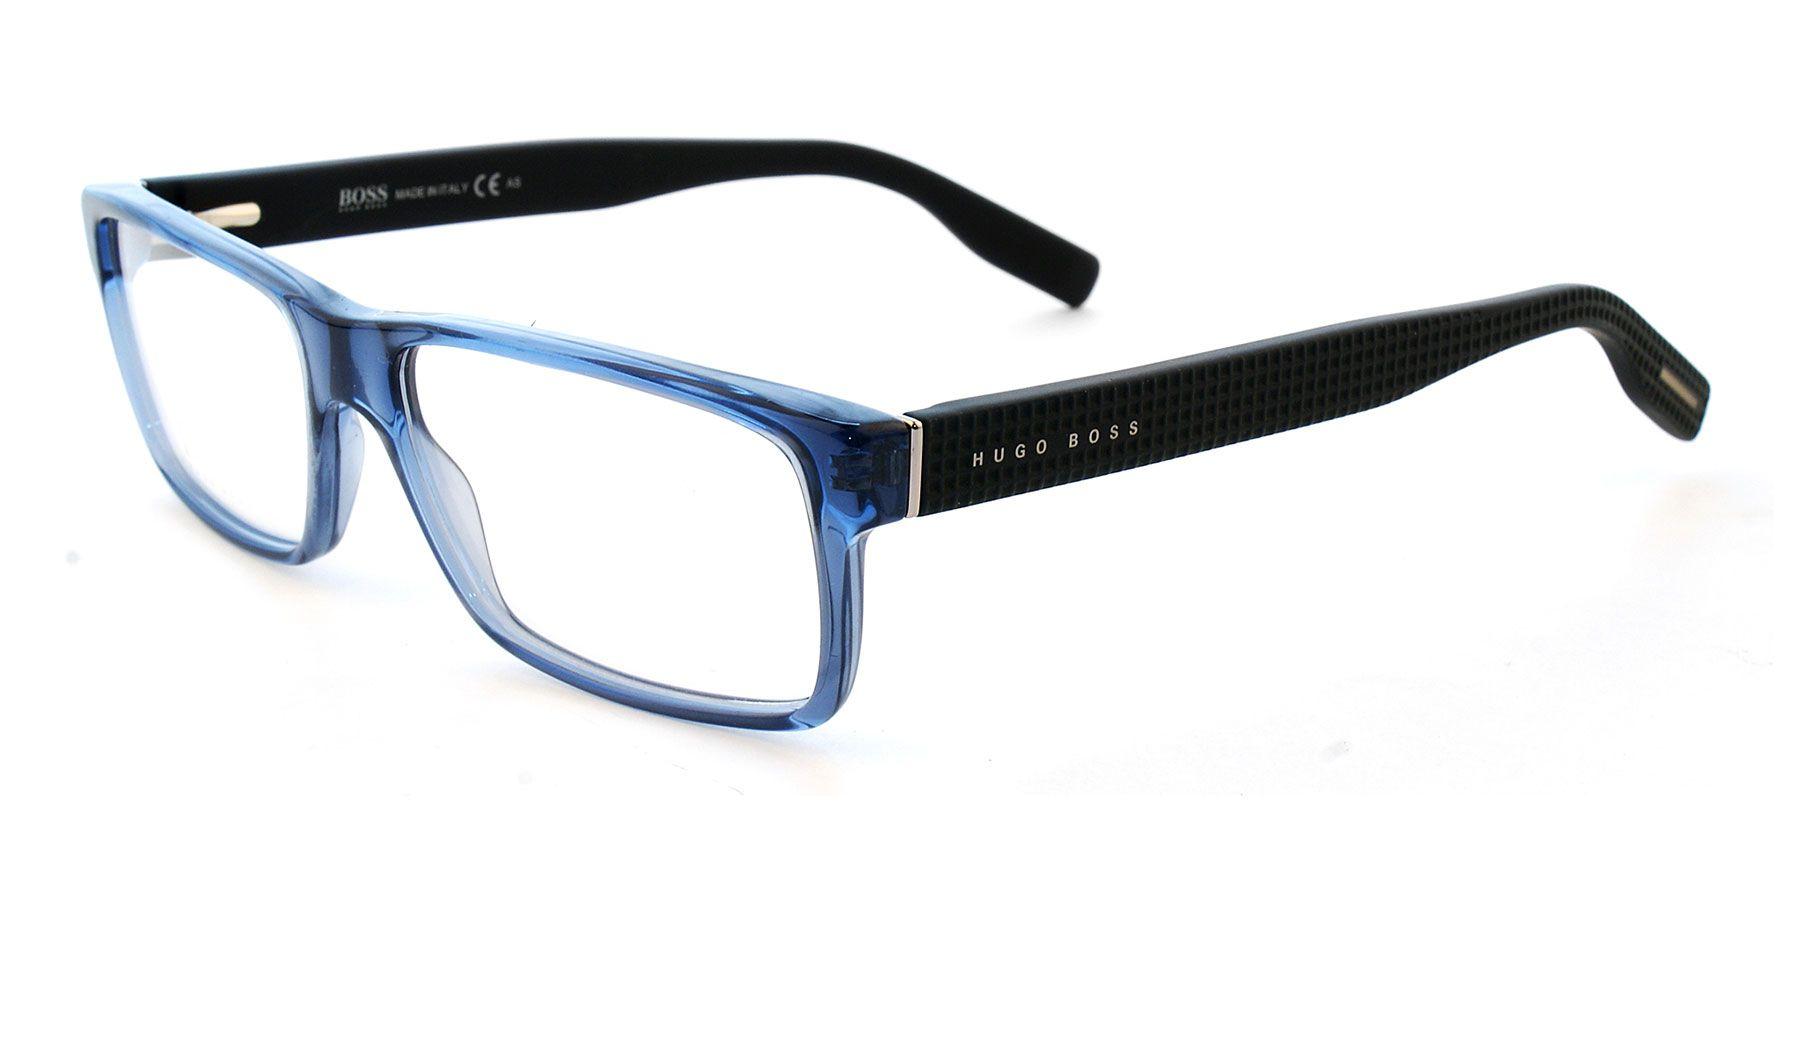 132960 - Hugo Boss Going to need some new eyewear soon I like these ...